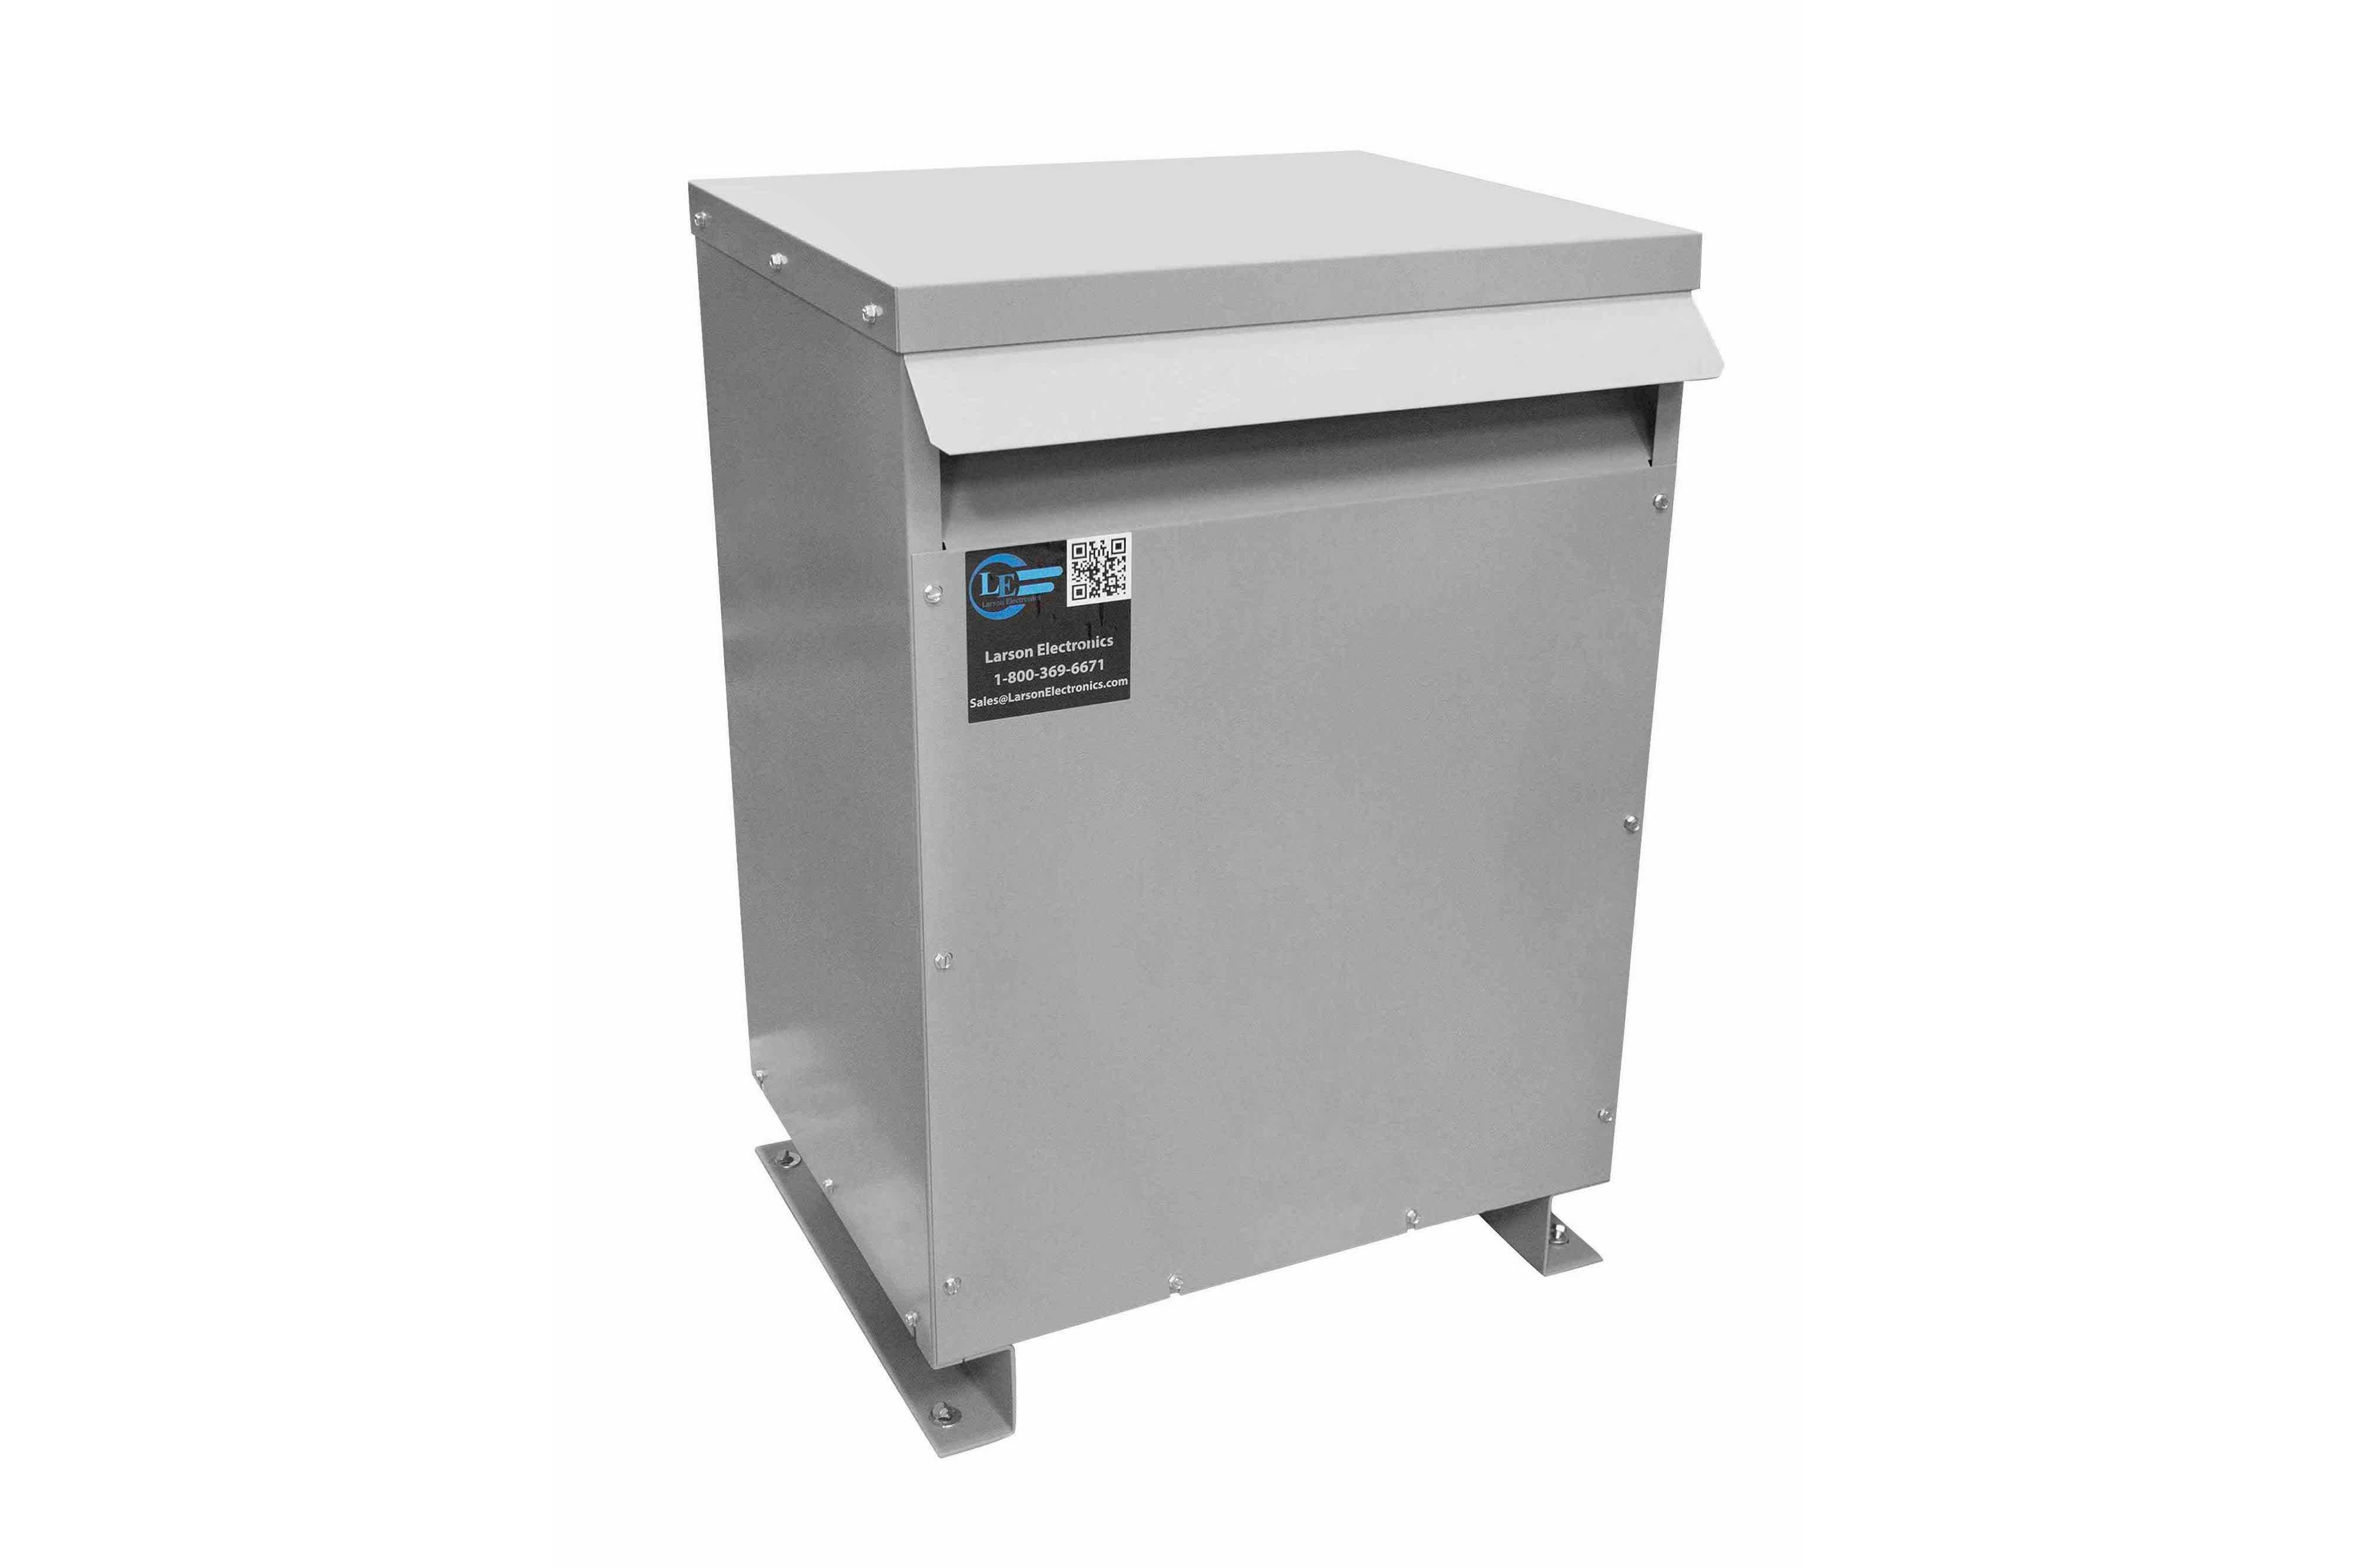 80 kVA 3PH Isolation Transformer, 480V Wye Primary, 380V Delta Secondary, N3R, Ventilated, 60 Hz